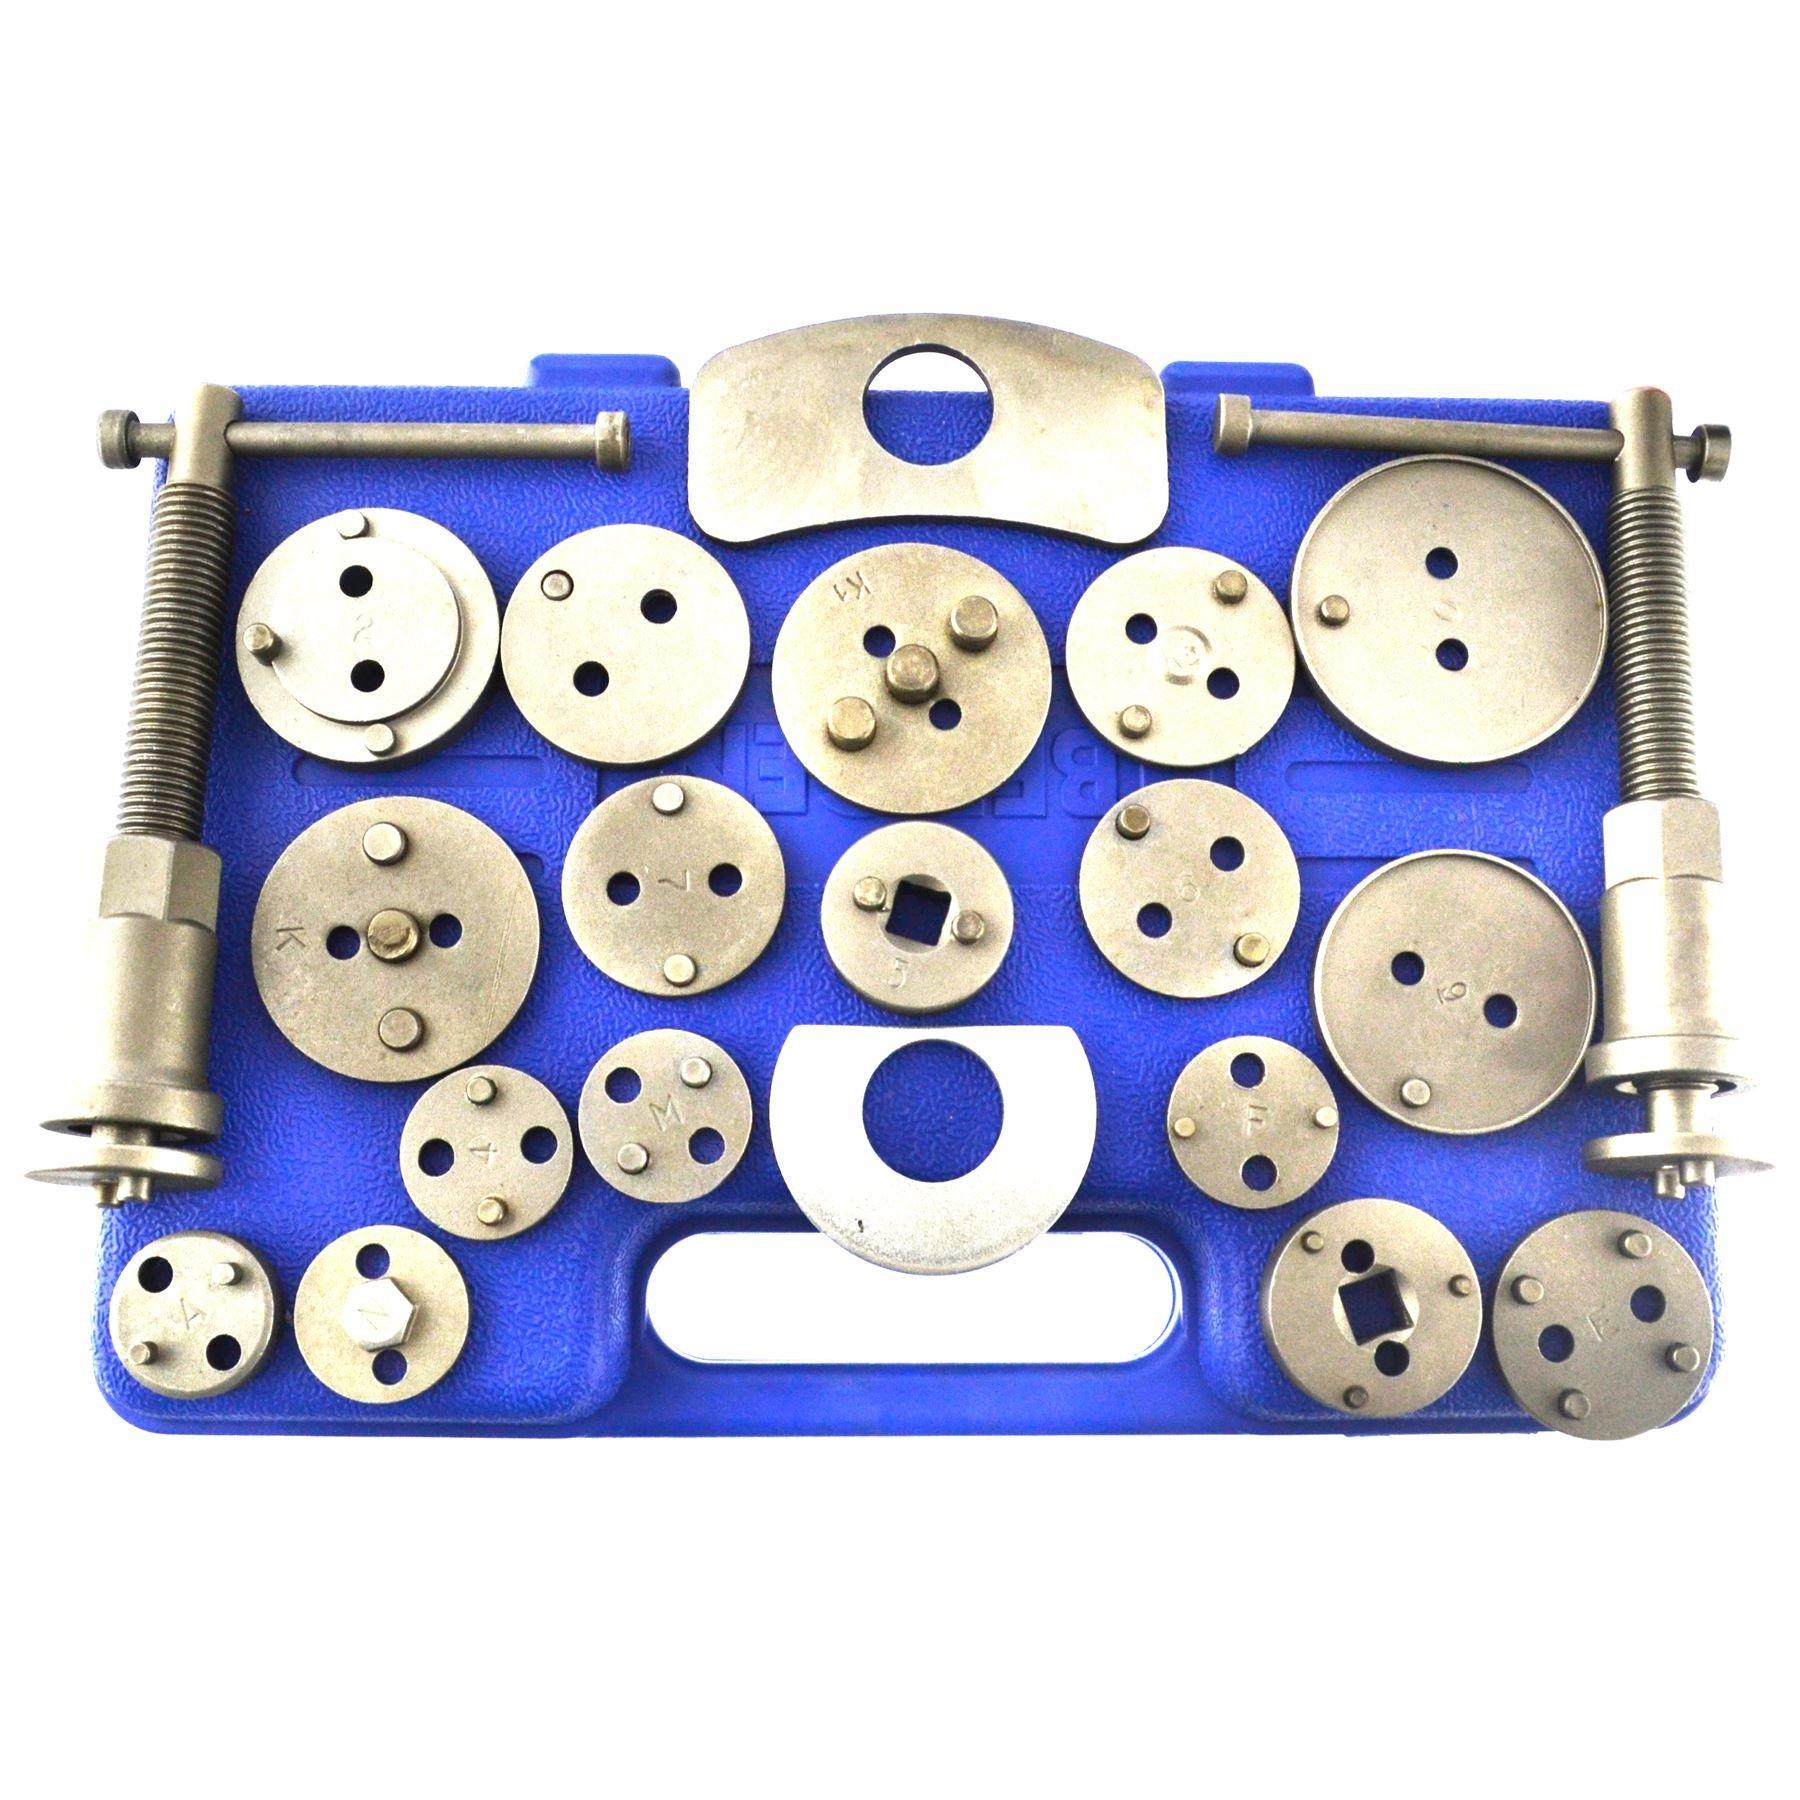 AB Tools-US Pro 21pc Left and Right Hand Brake Calliper Piston Wind Back Tool Kit AU019 by AB Tools-US Pro (Image #3)